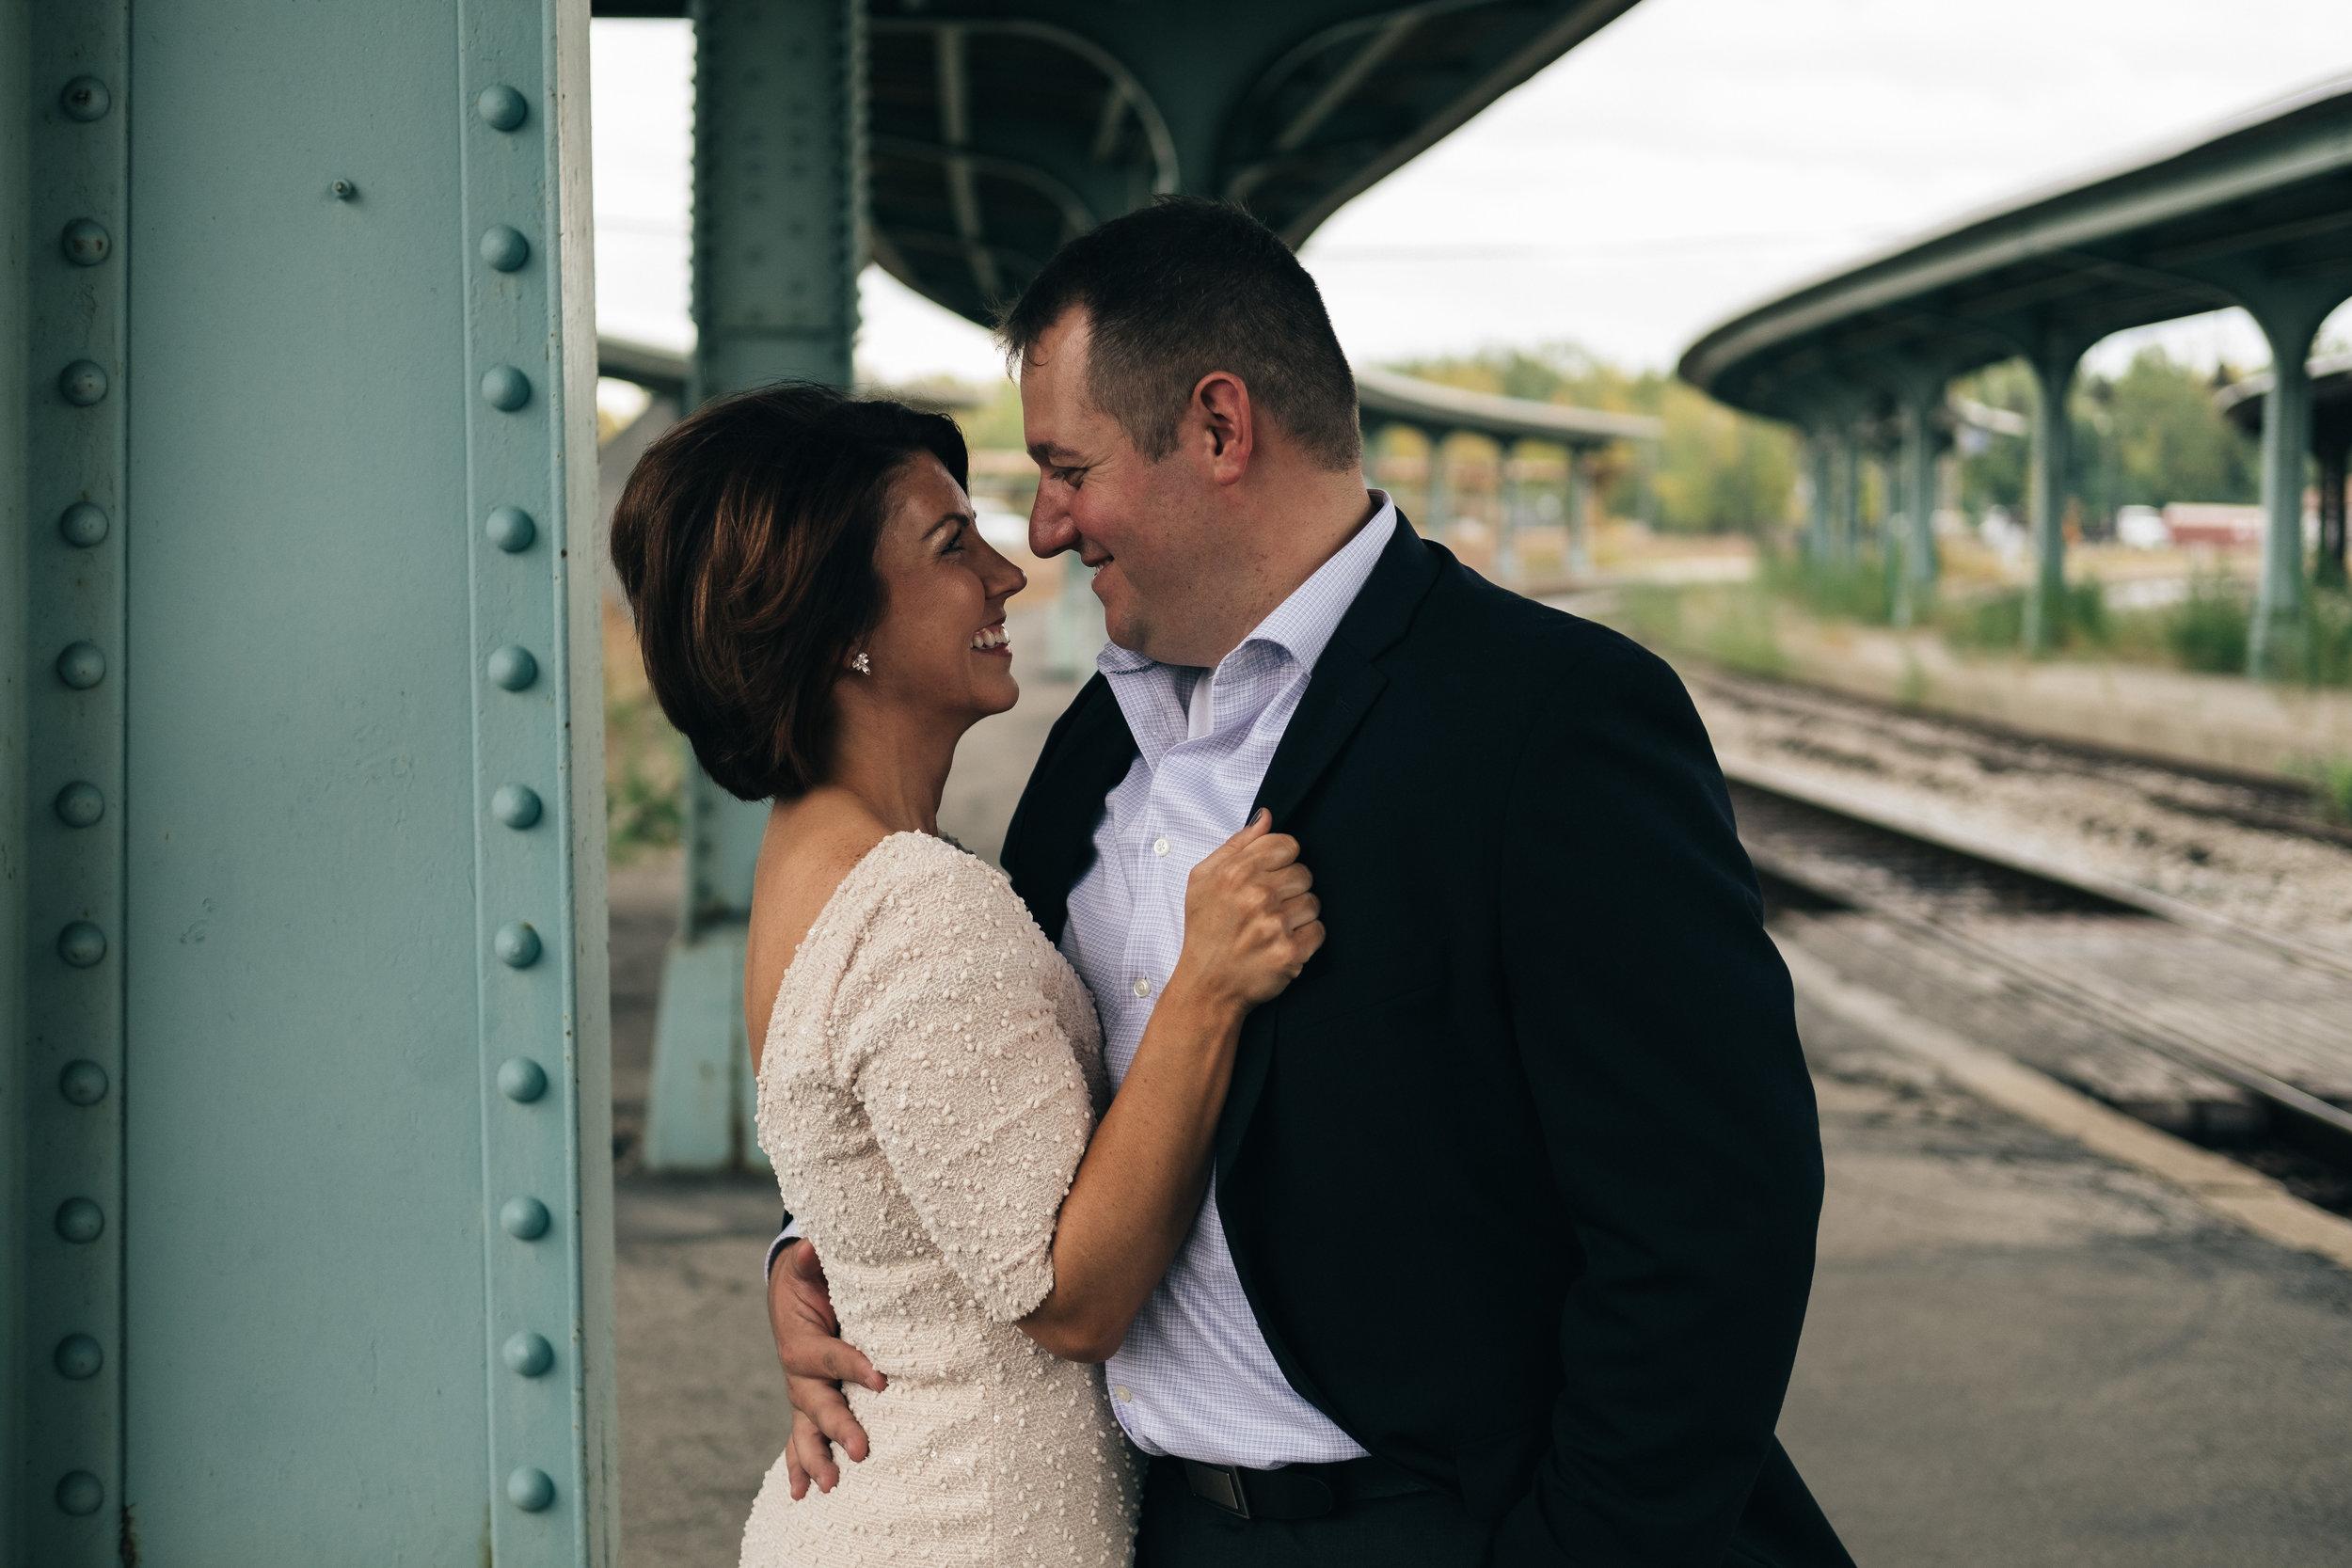 Engagement session at Toledo Amtrak Station.